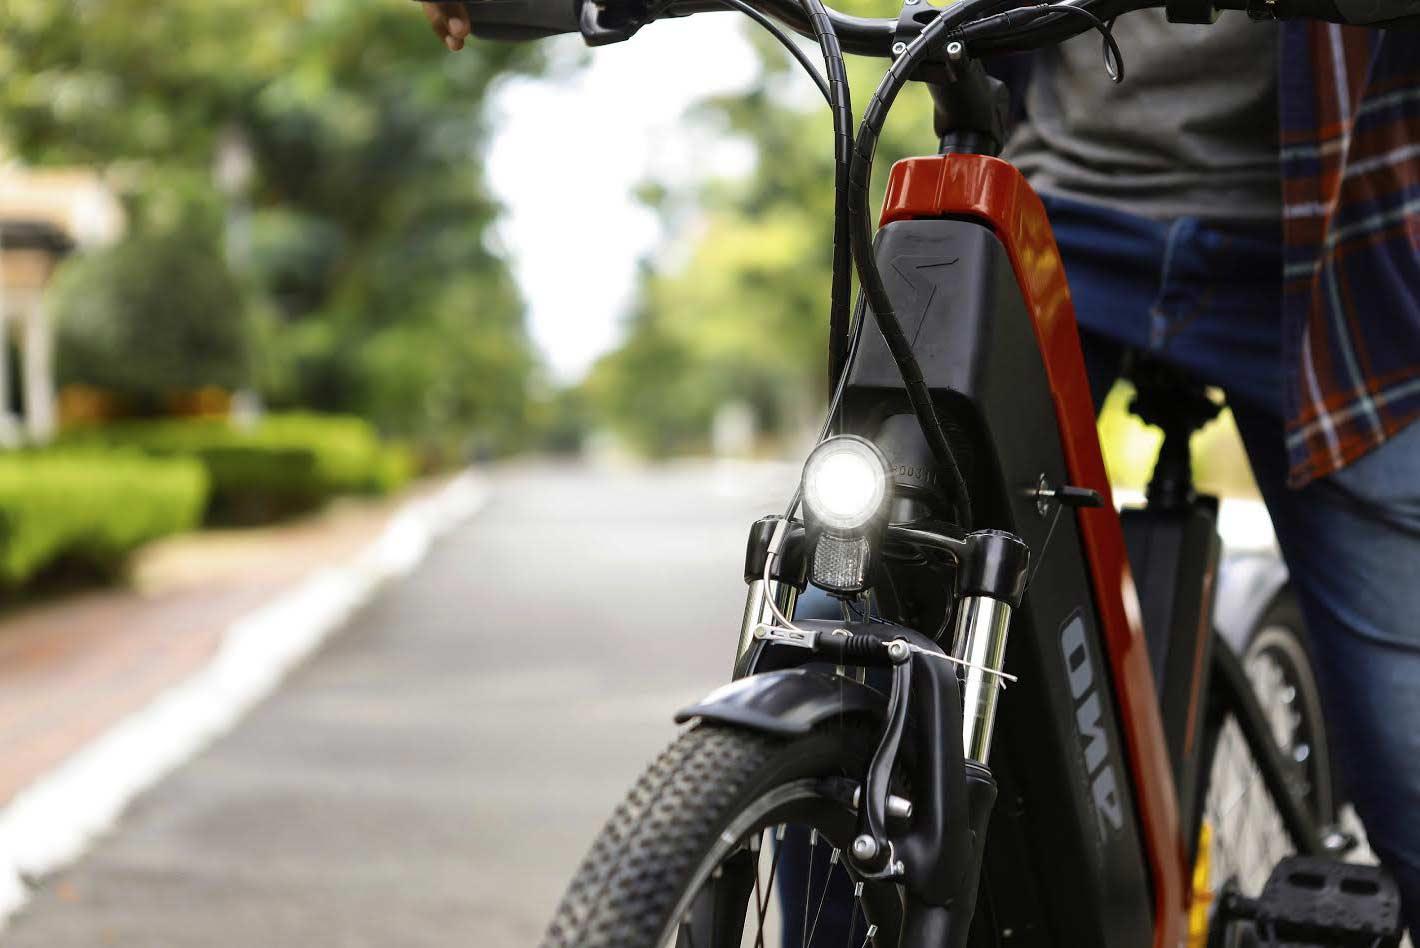 Tronx-One-Electric-Bike-headlight